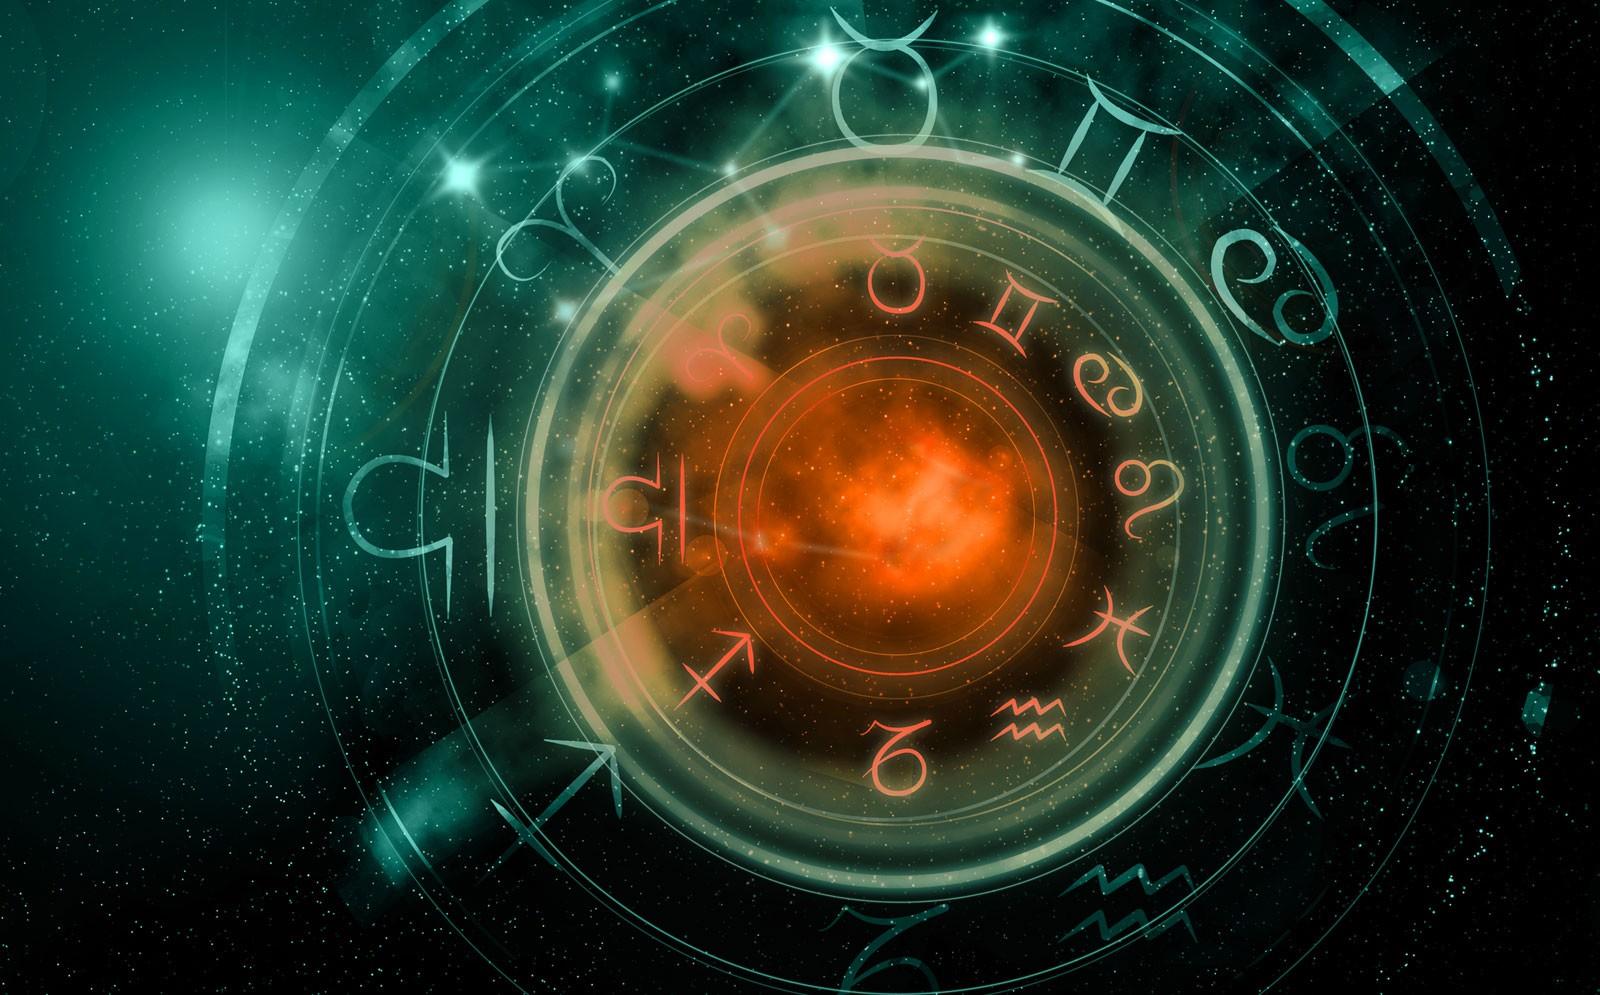 zodiac symbols and zodiac signs